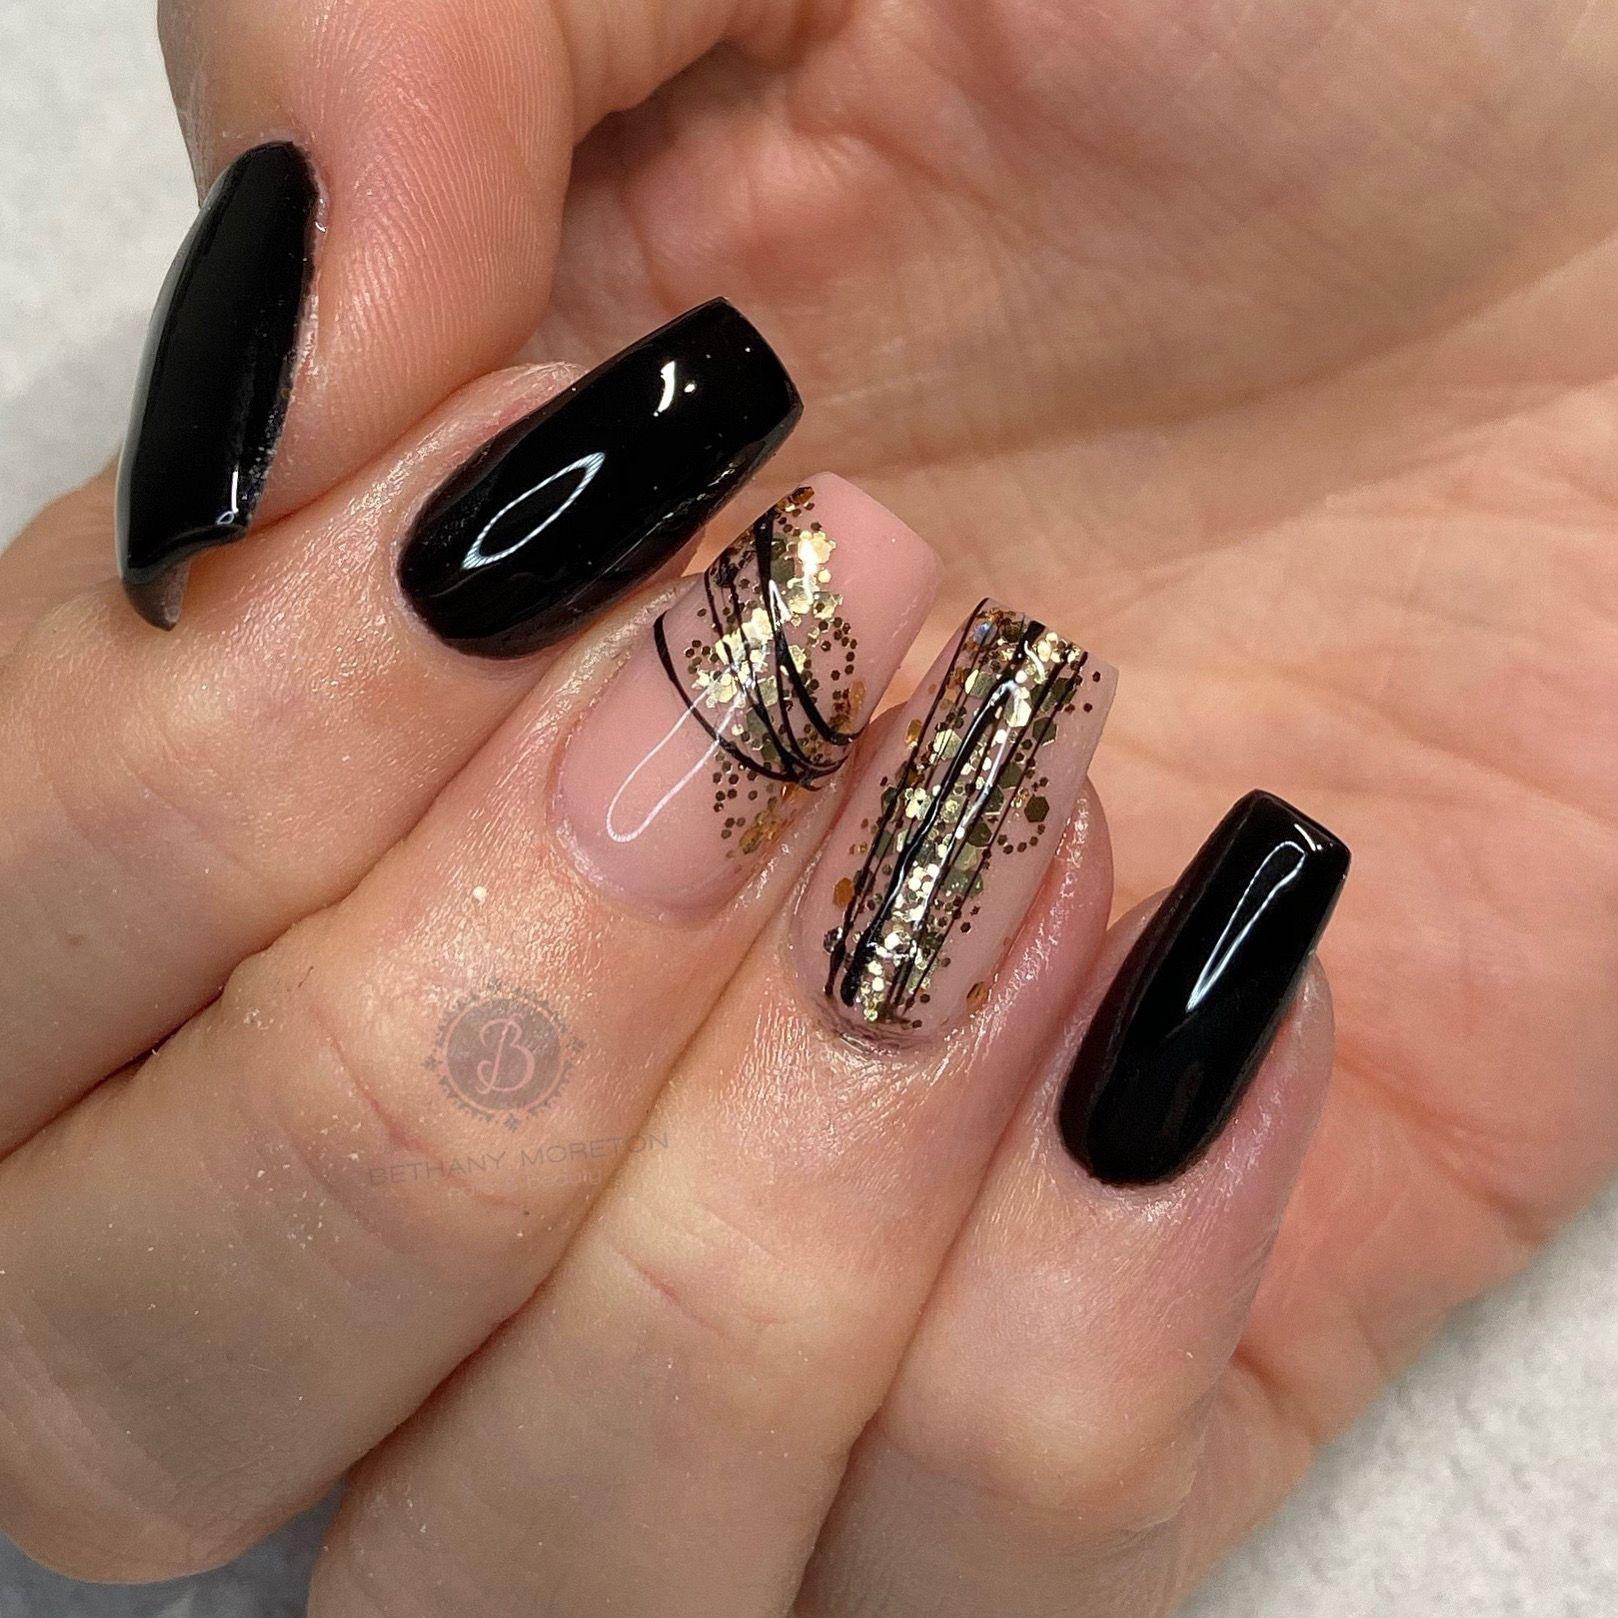 . #nails #thegelbottle #biab #nailtech #nailsbybeff #Staffordshire #biddulph #cheshire #nailart #love #fashion #nailtechnician #scratchmagazine  #nailaddict #nailpro #showscratch #polish #nailfie #nailartist